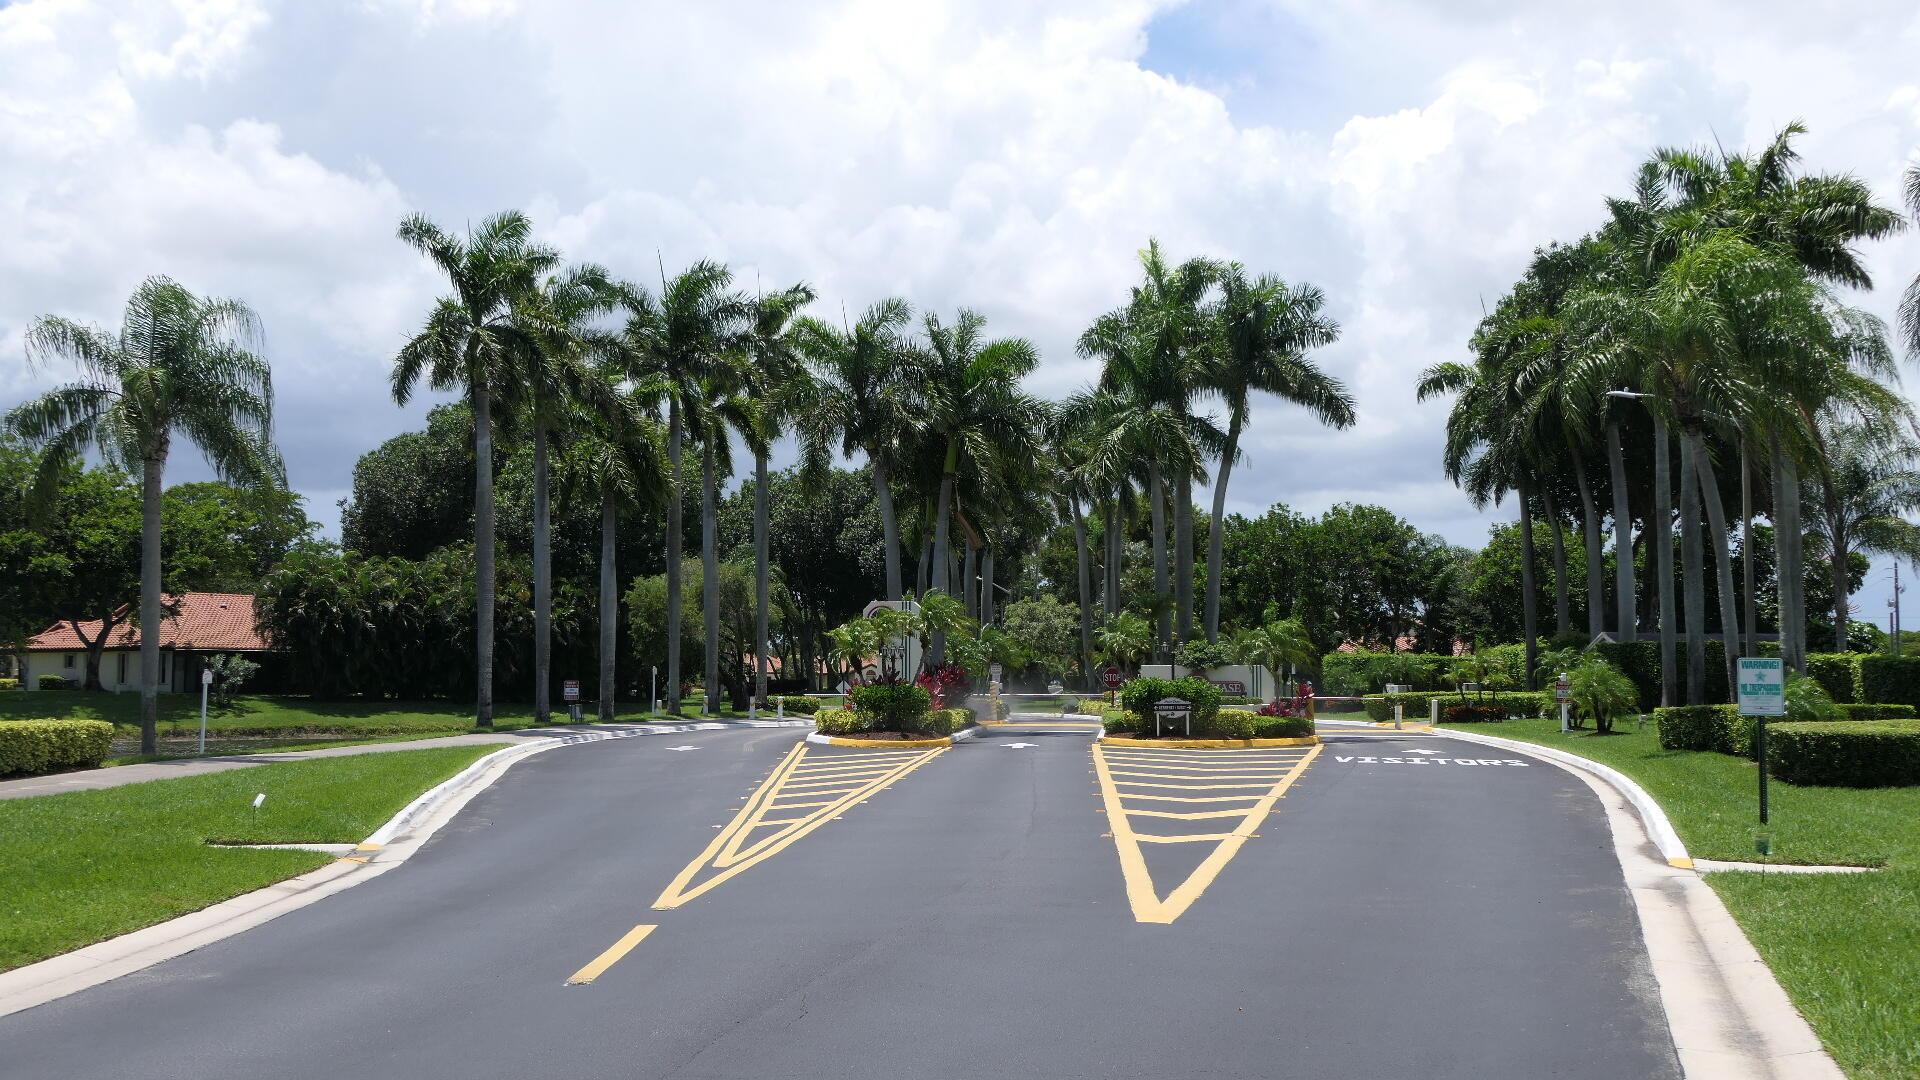 10977 Washingtonia Palm Court B Boynton Beach, FL 33437 photo 58